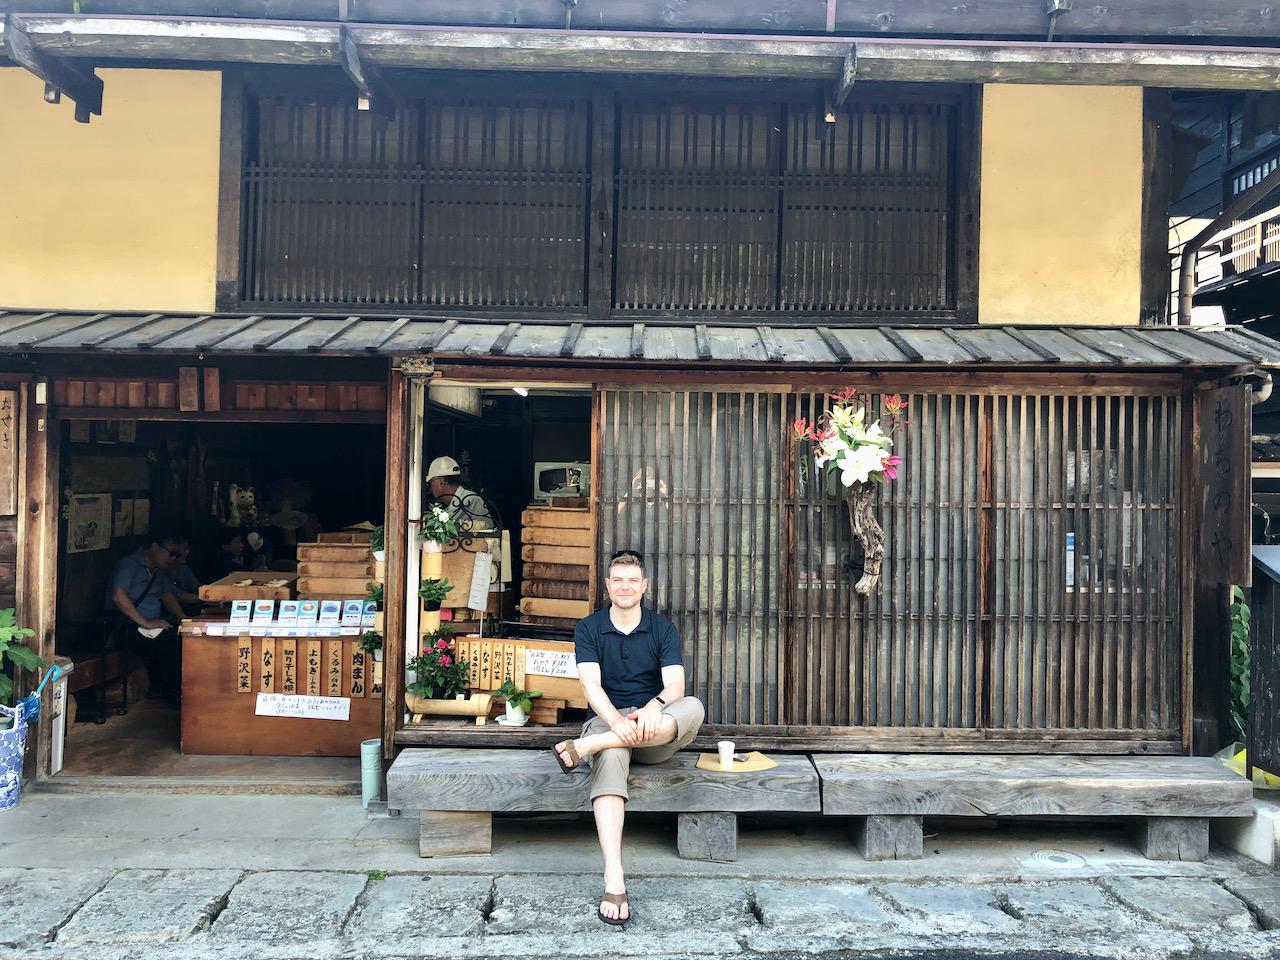 Dumpling-Shop in Tsumago, Nagiso-Machi, Kiso-Gun, Nagano, Japan (08.09.2019)